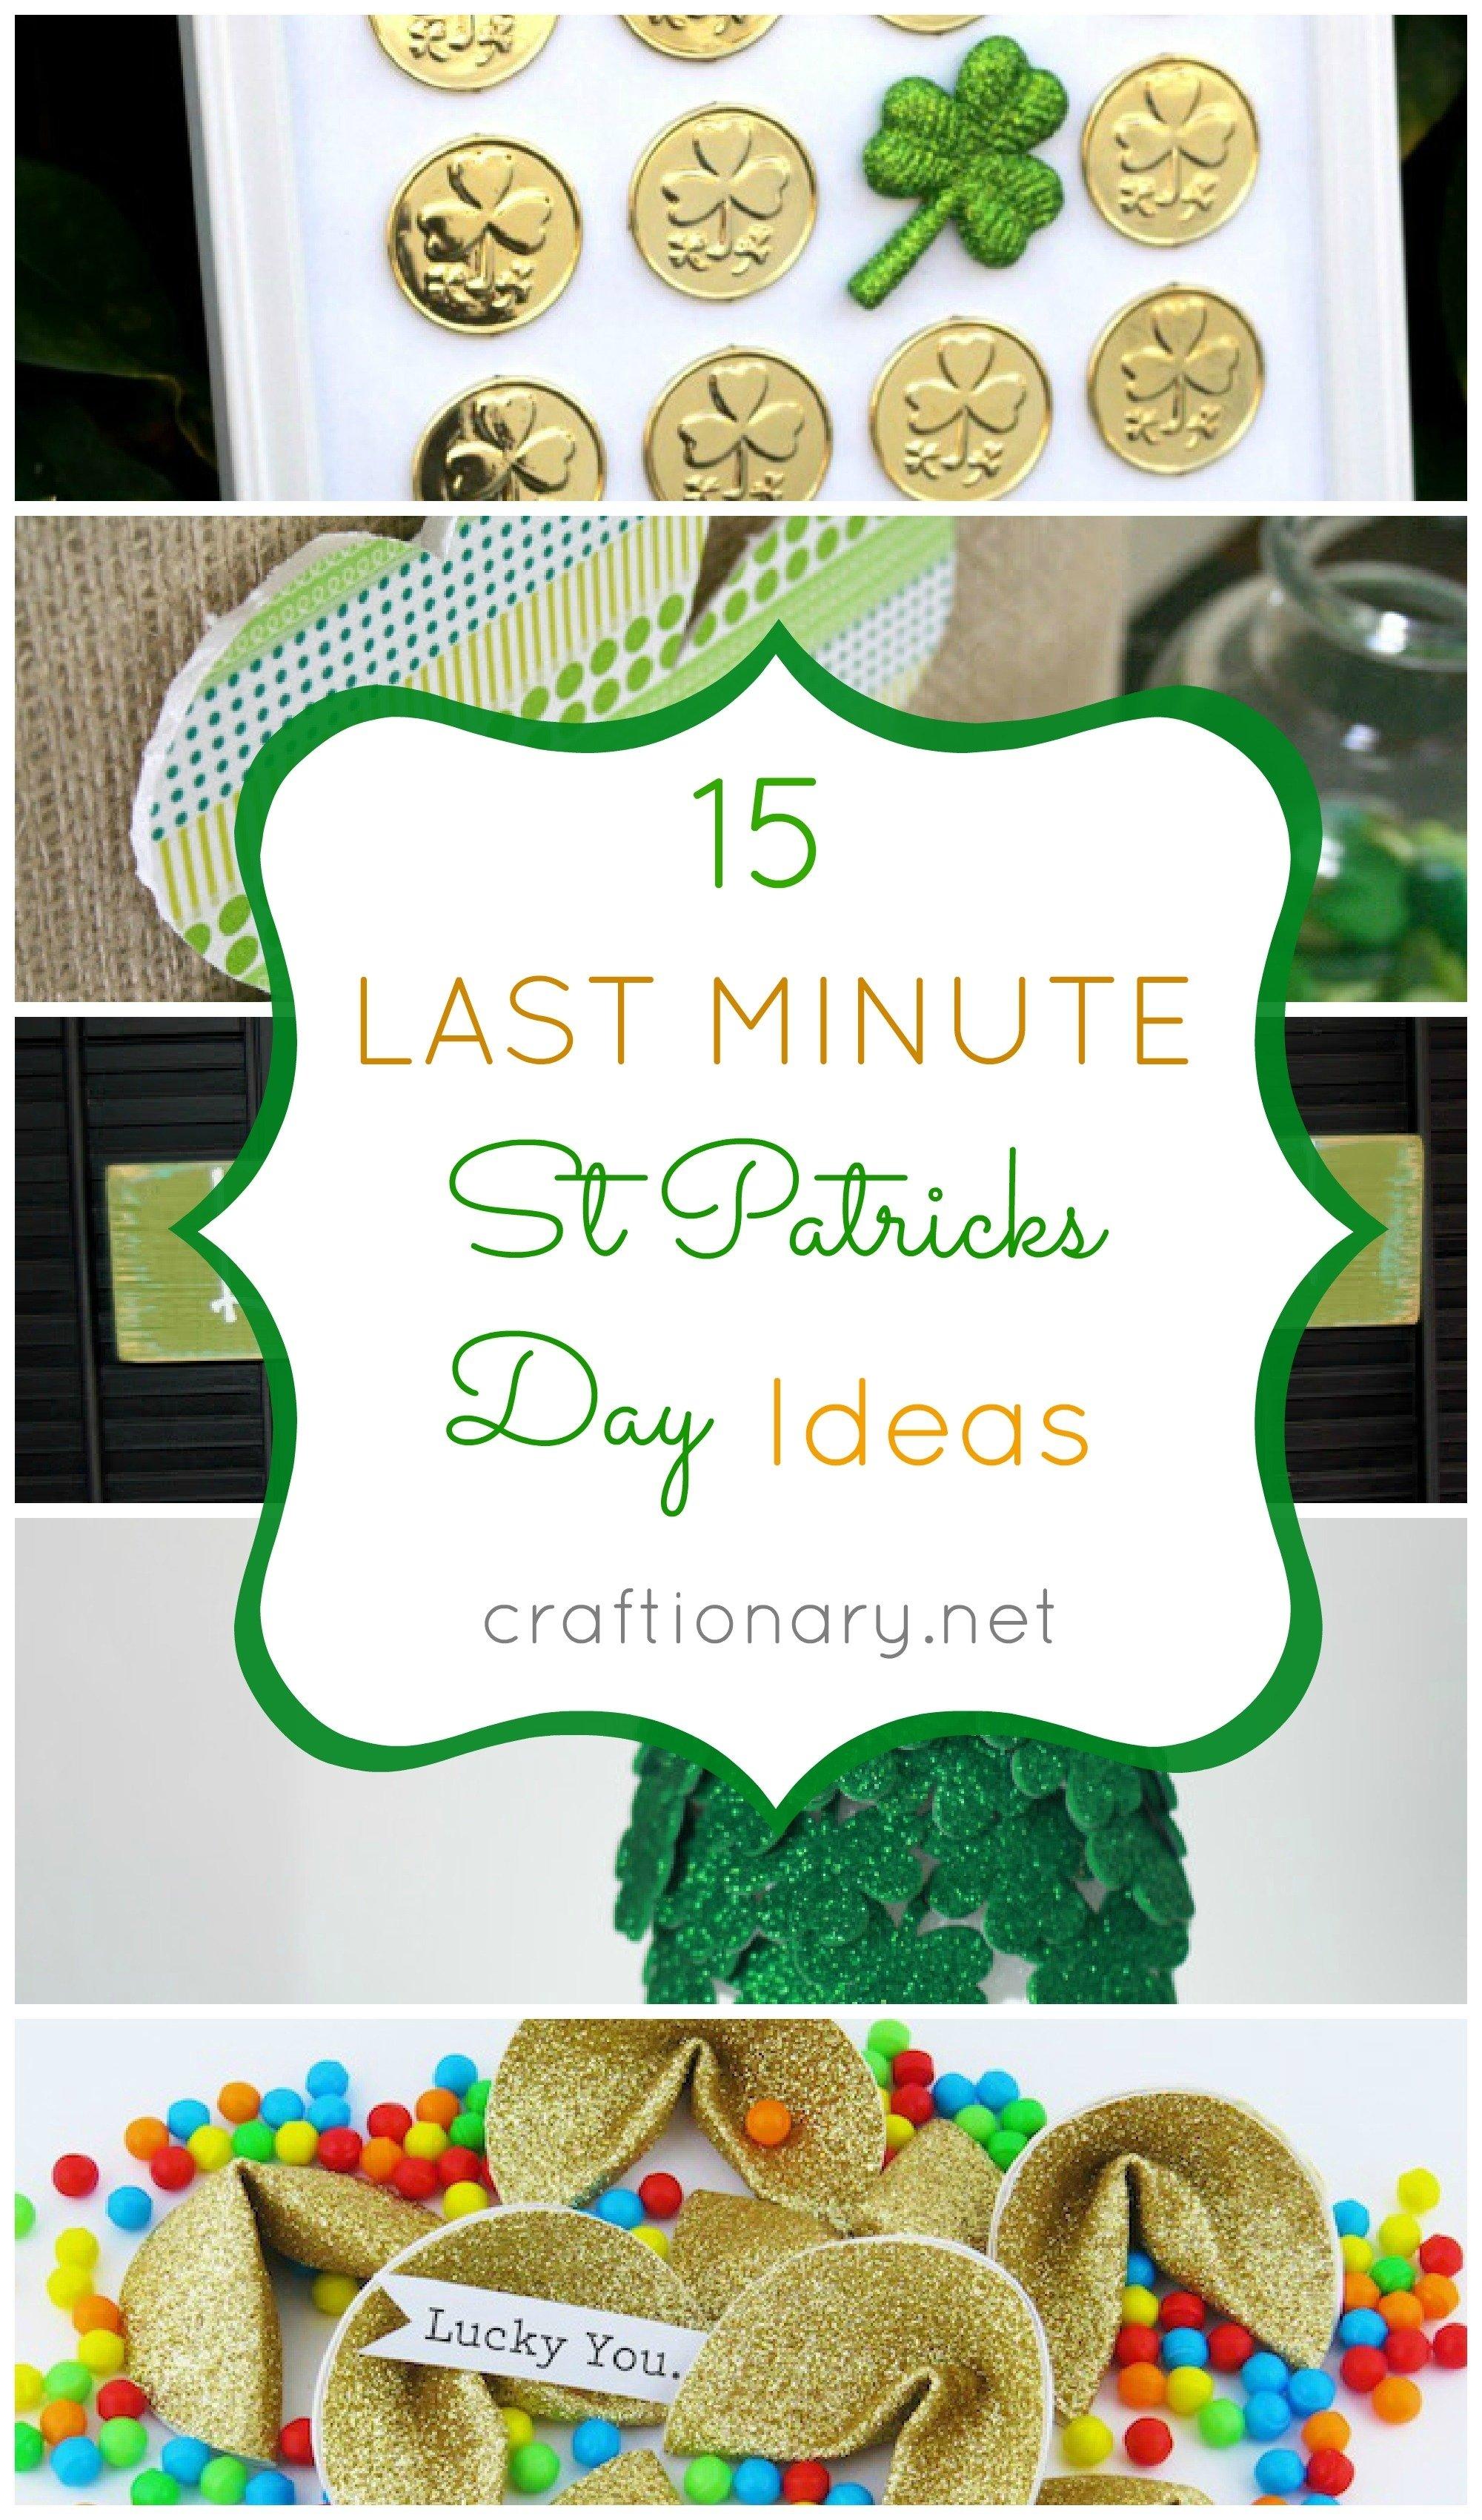 10 Lovable St Patricks Day Craft Ideas craftionary 10 2020